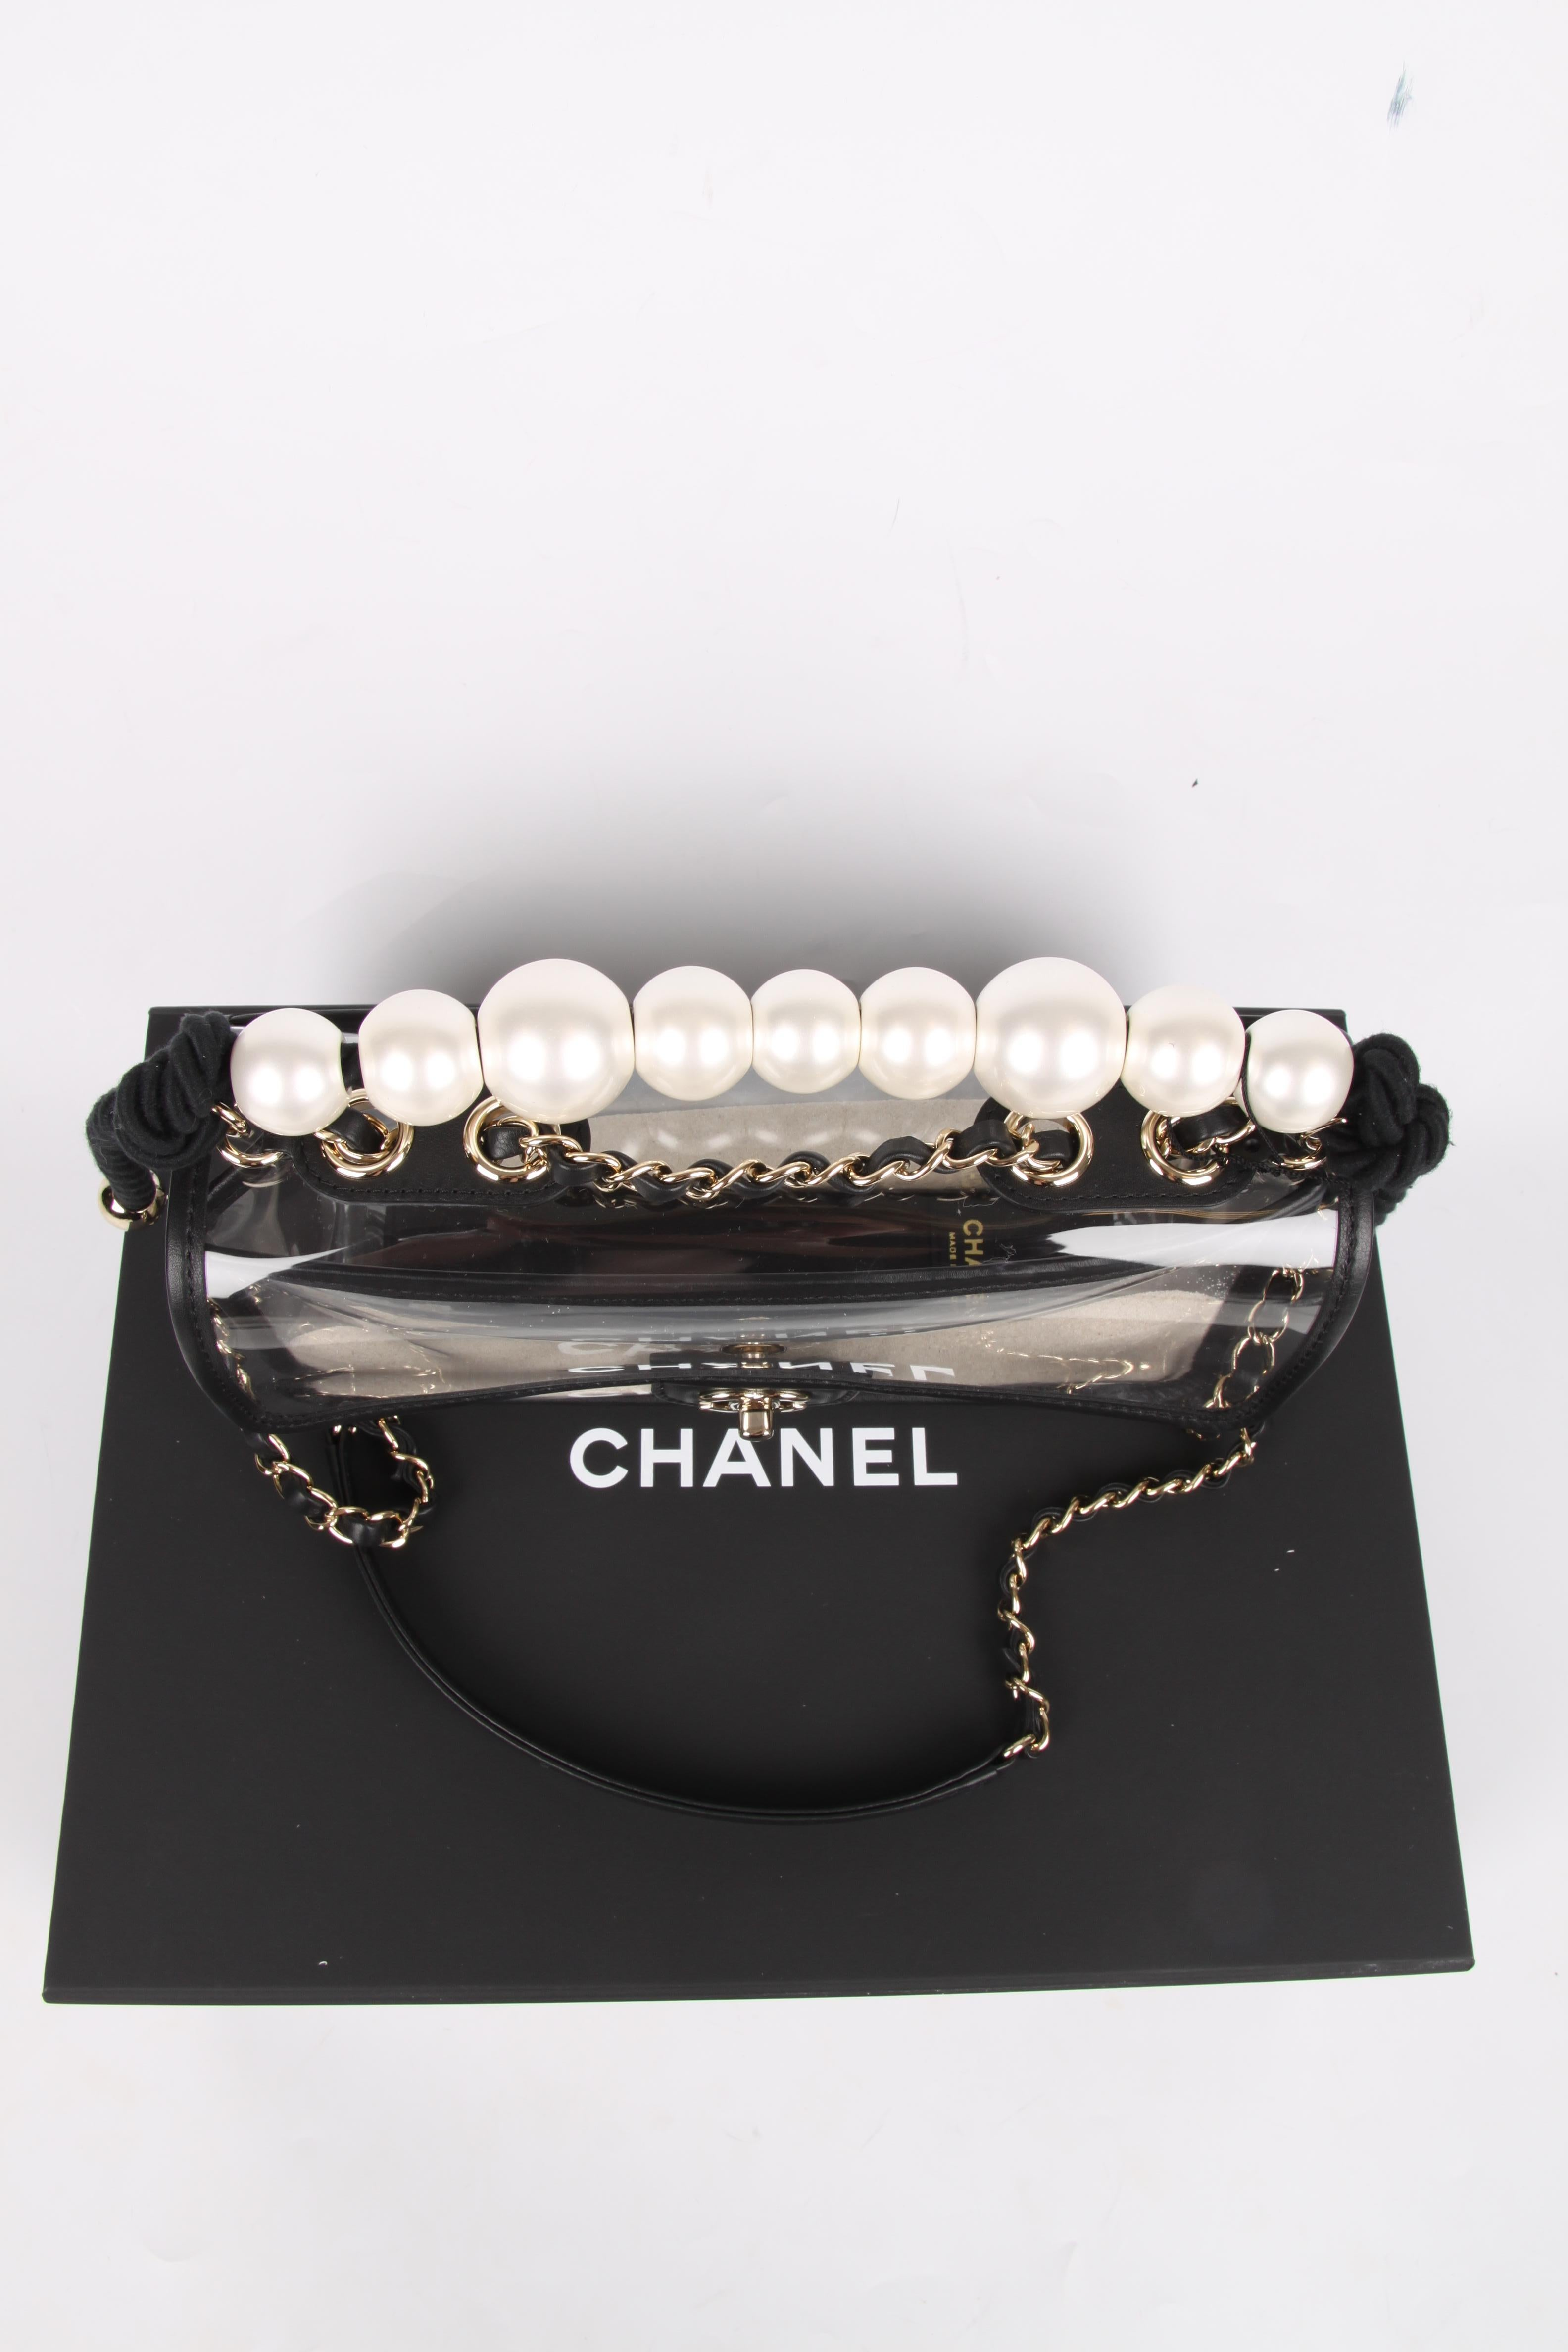 667cda569af7f8 Chanel See-Through Sand Flap Bag - black at 1stdibs